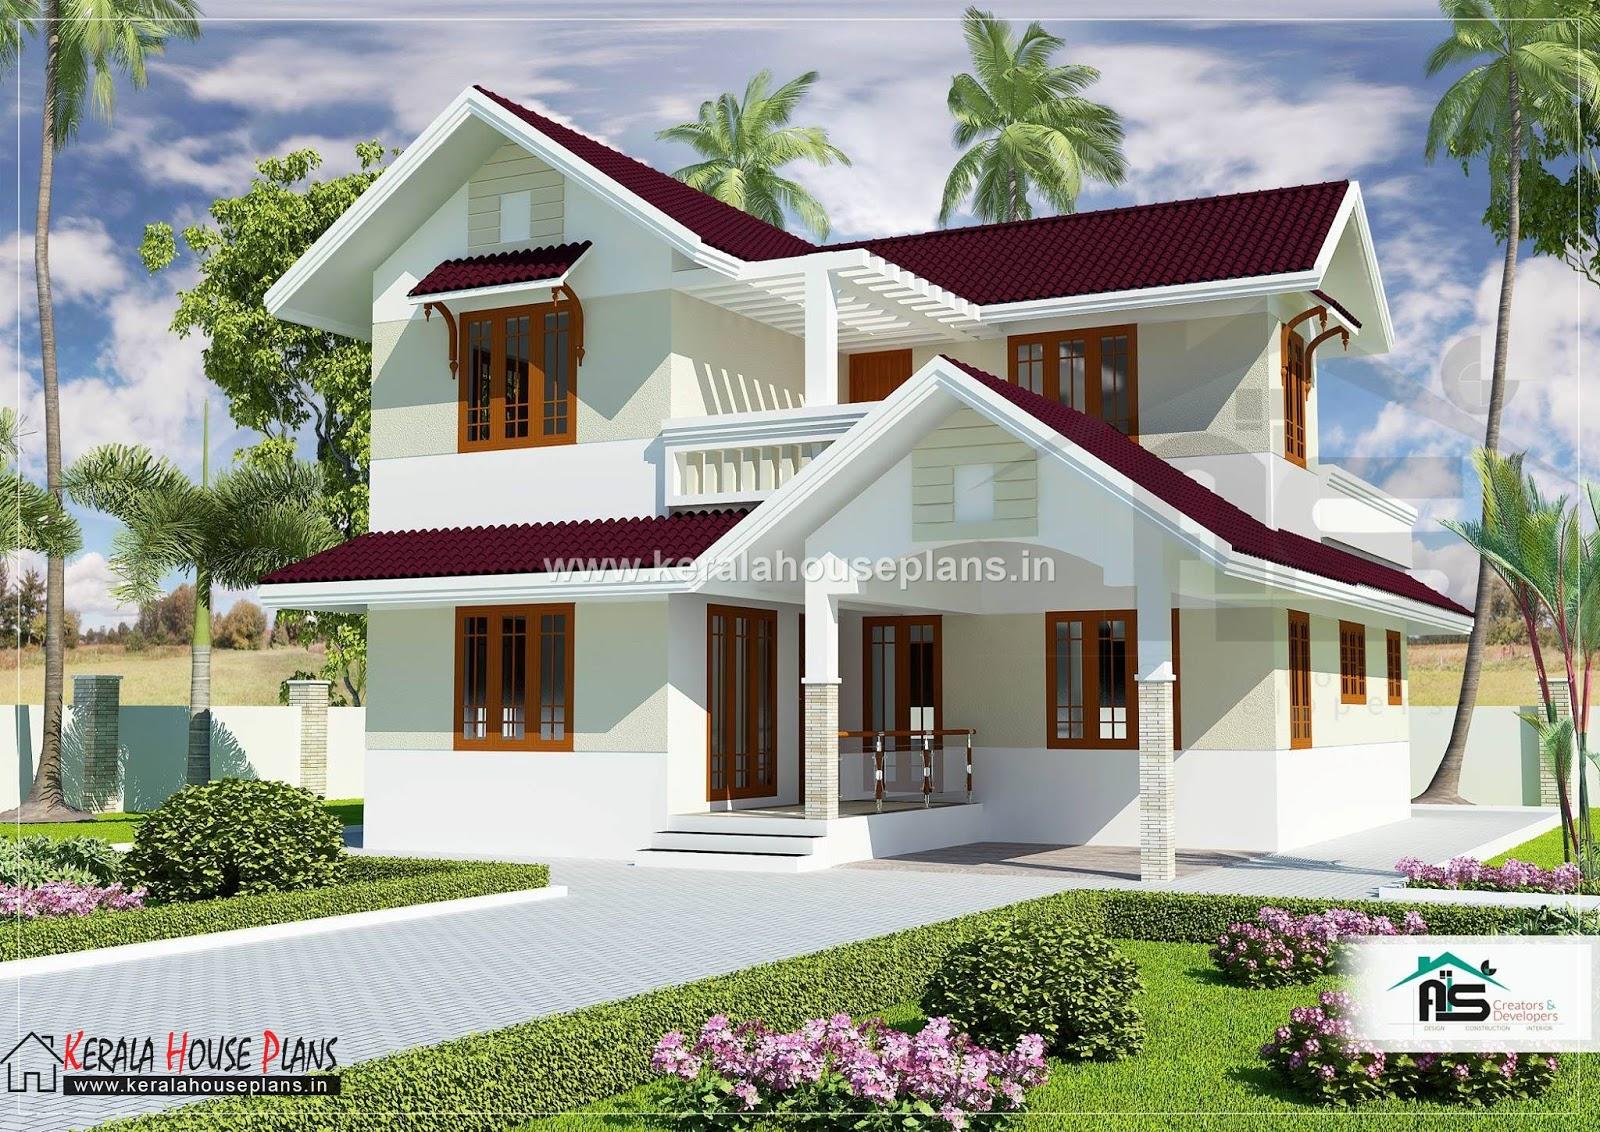 kerala model house plans with elevation 1829 sqft | Kerala ...